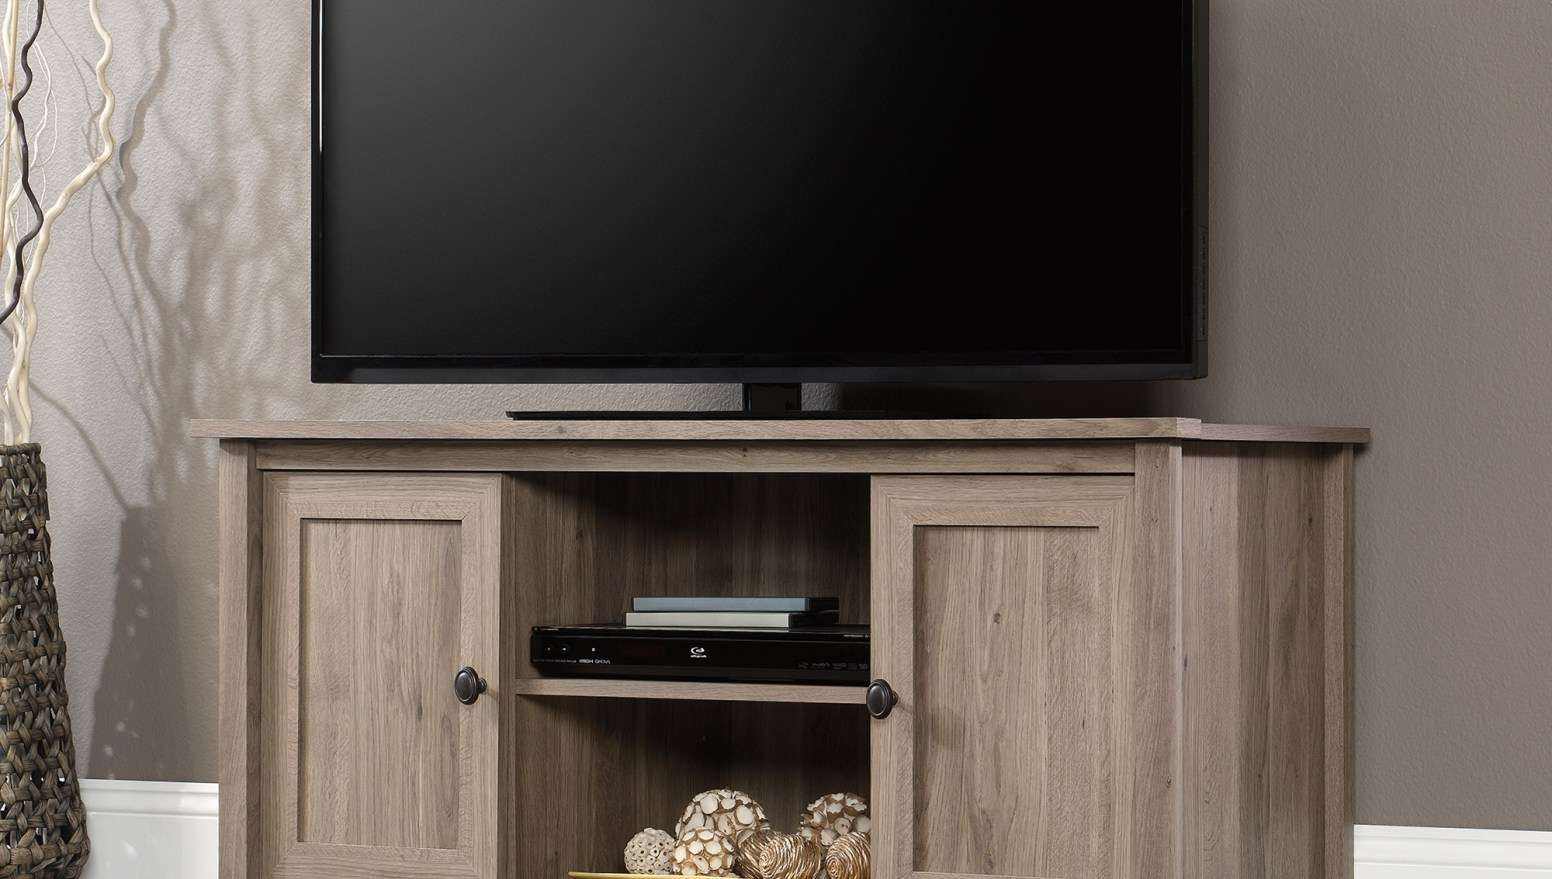 Tv : Bu Amazing Tv Stands For Tube Tvs Amazon Com Bay Shore Intended For Tv Stands For Tube Tvs (View 3 of 15)